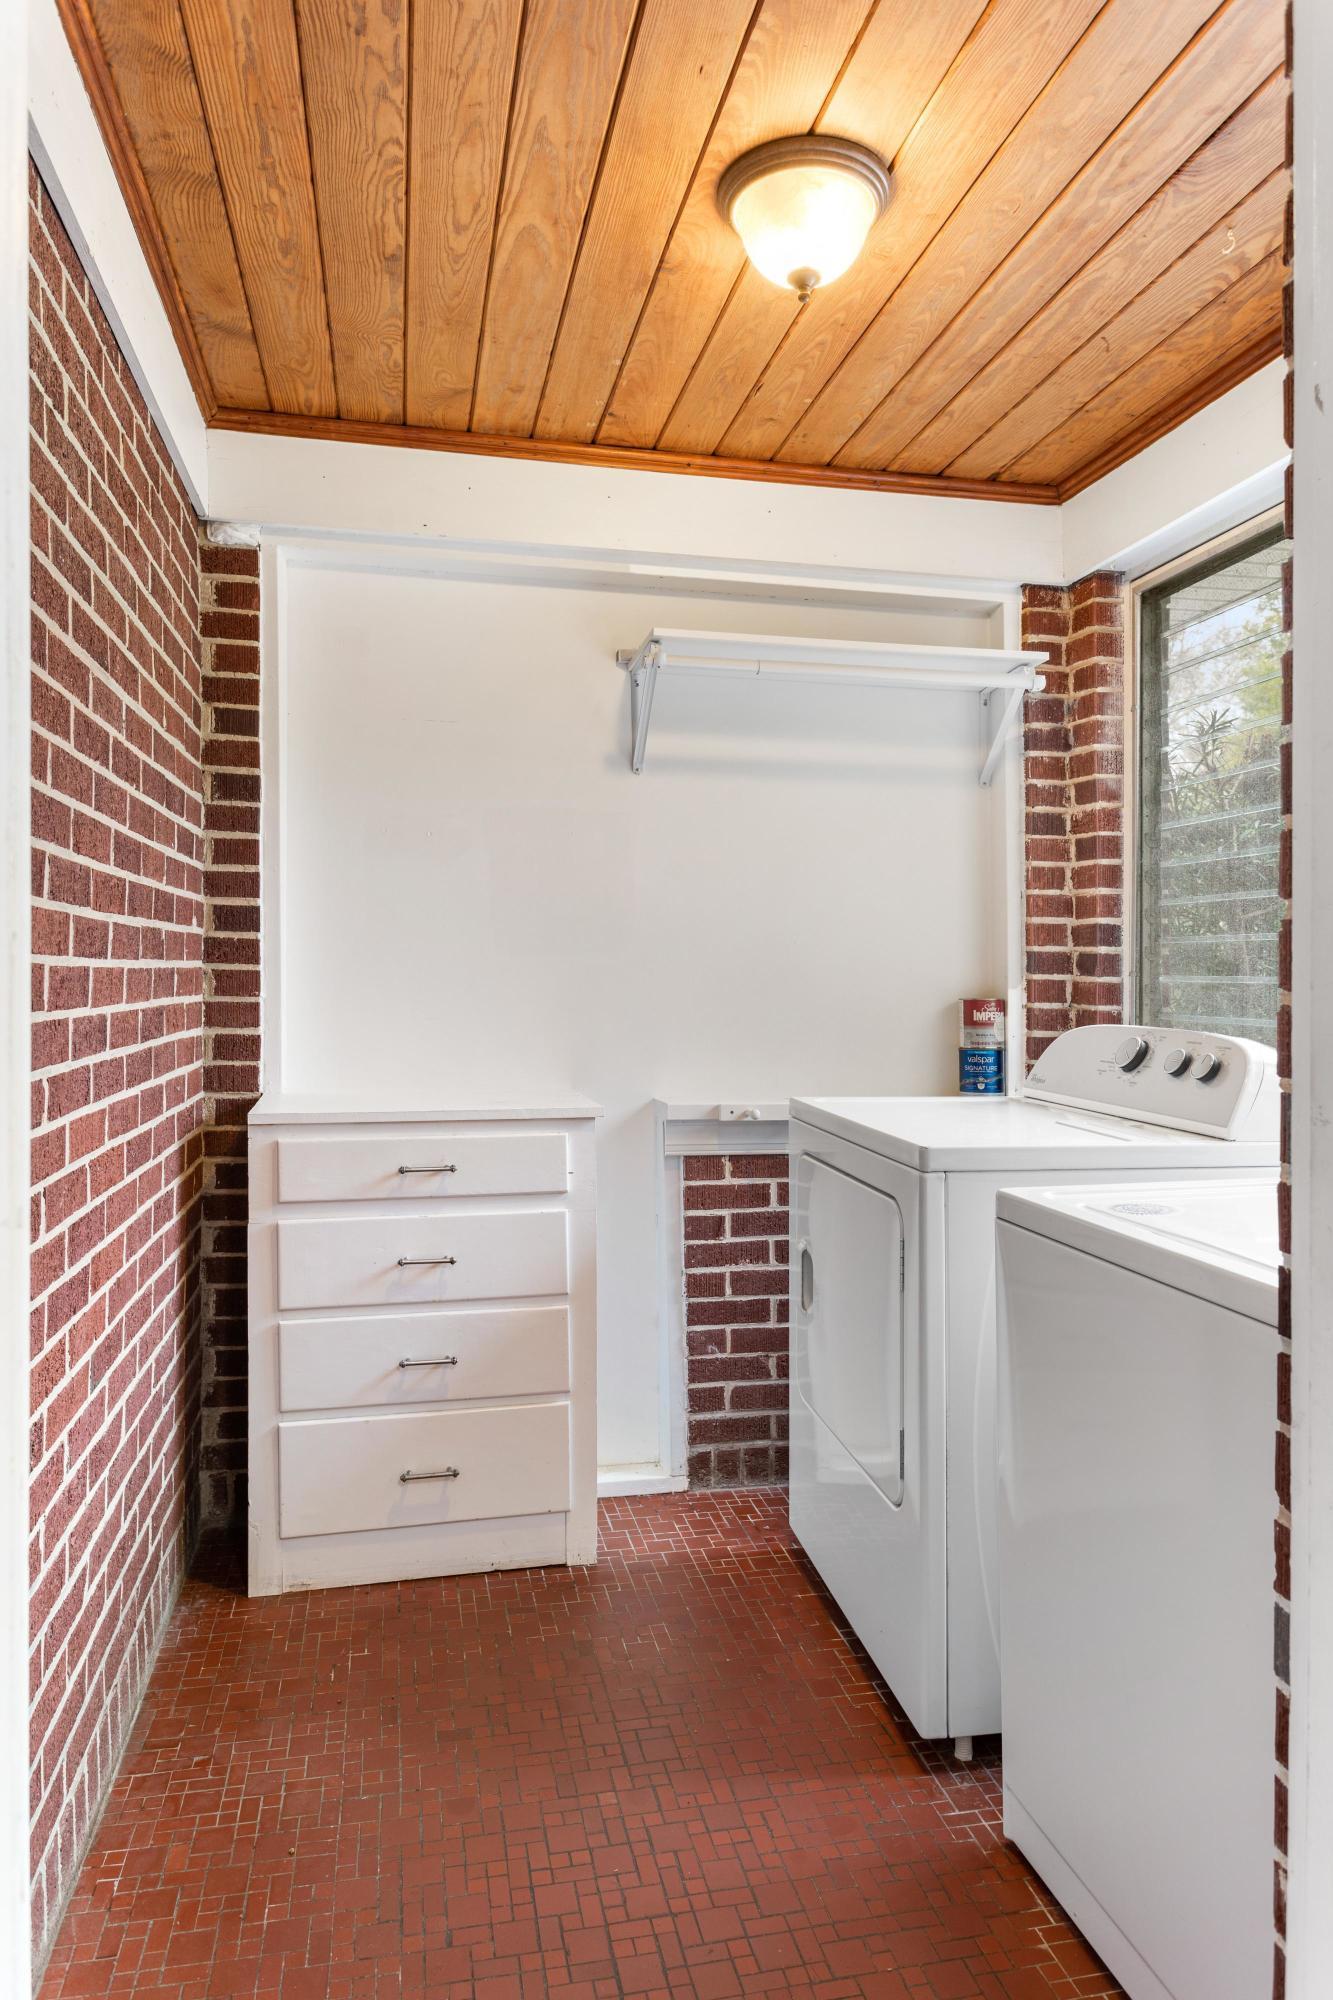 Dogwood Park Homes For Sale - 437 Cheves, Charleston, SC - 18